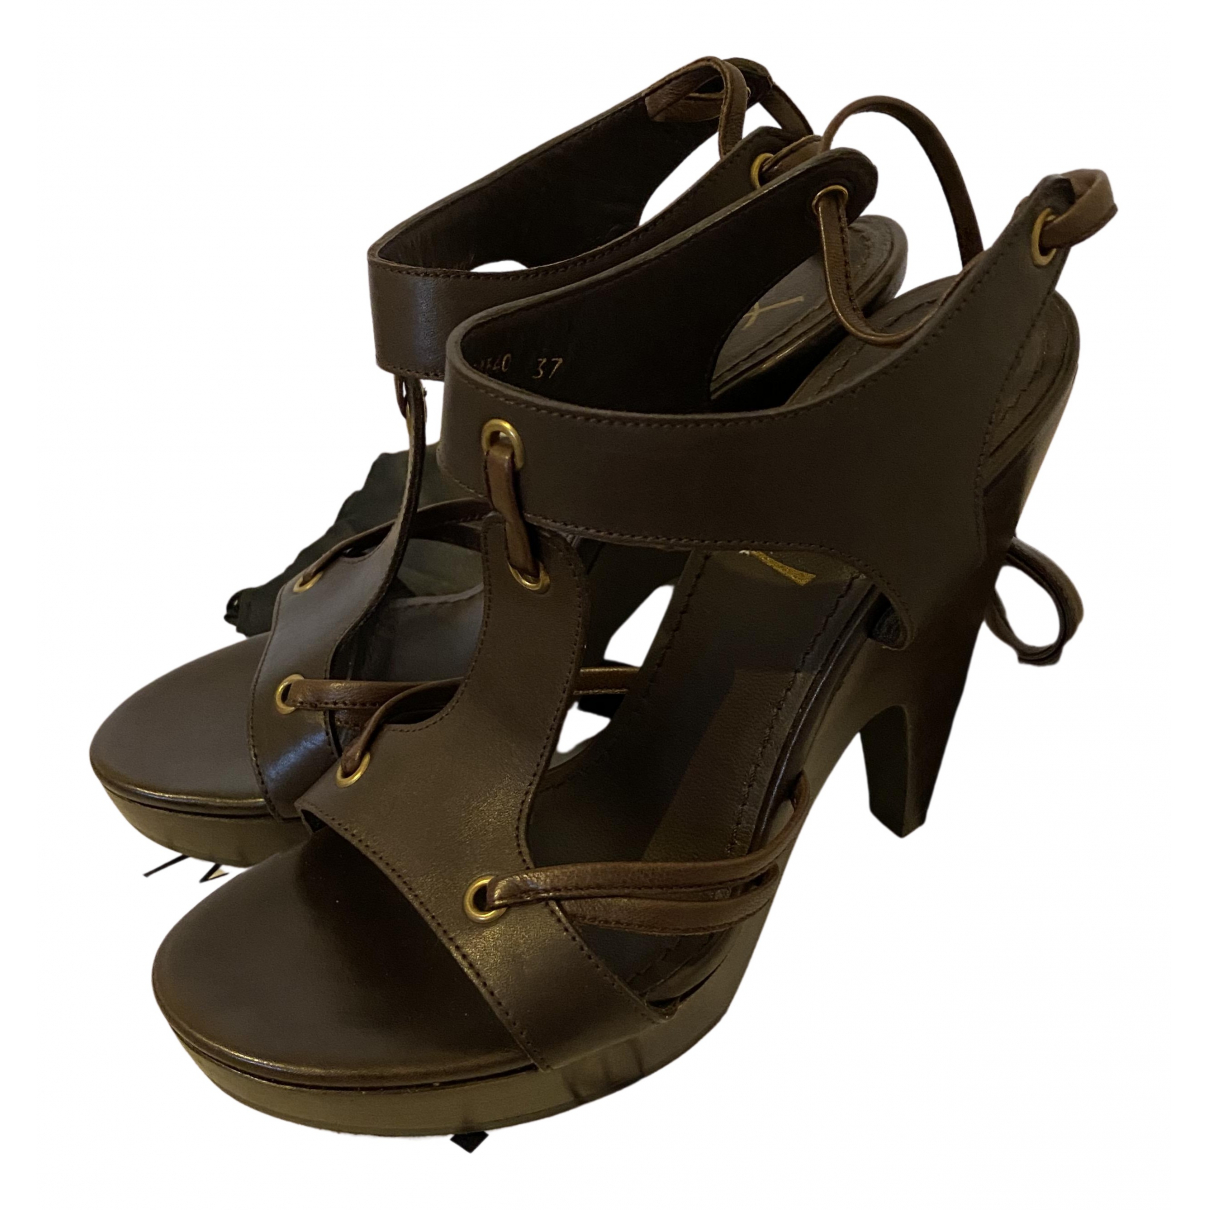 Sandalias de Cuero Yves Saint Laurent